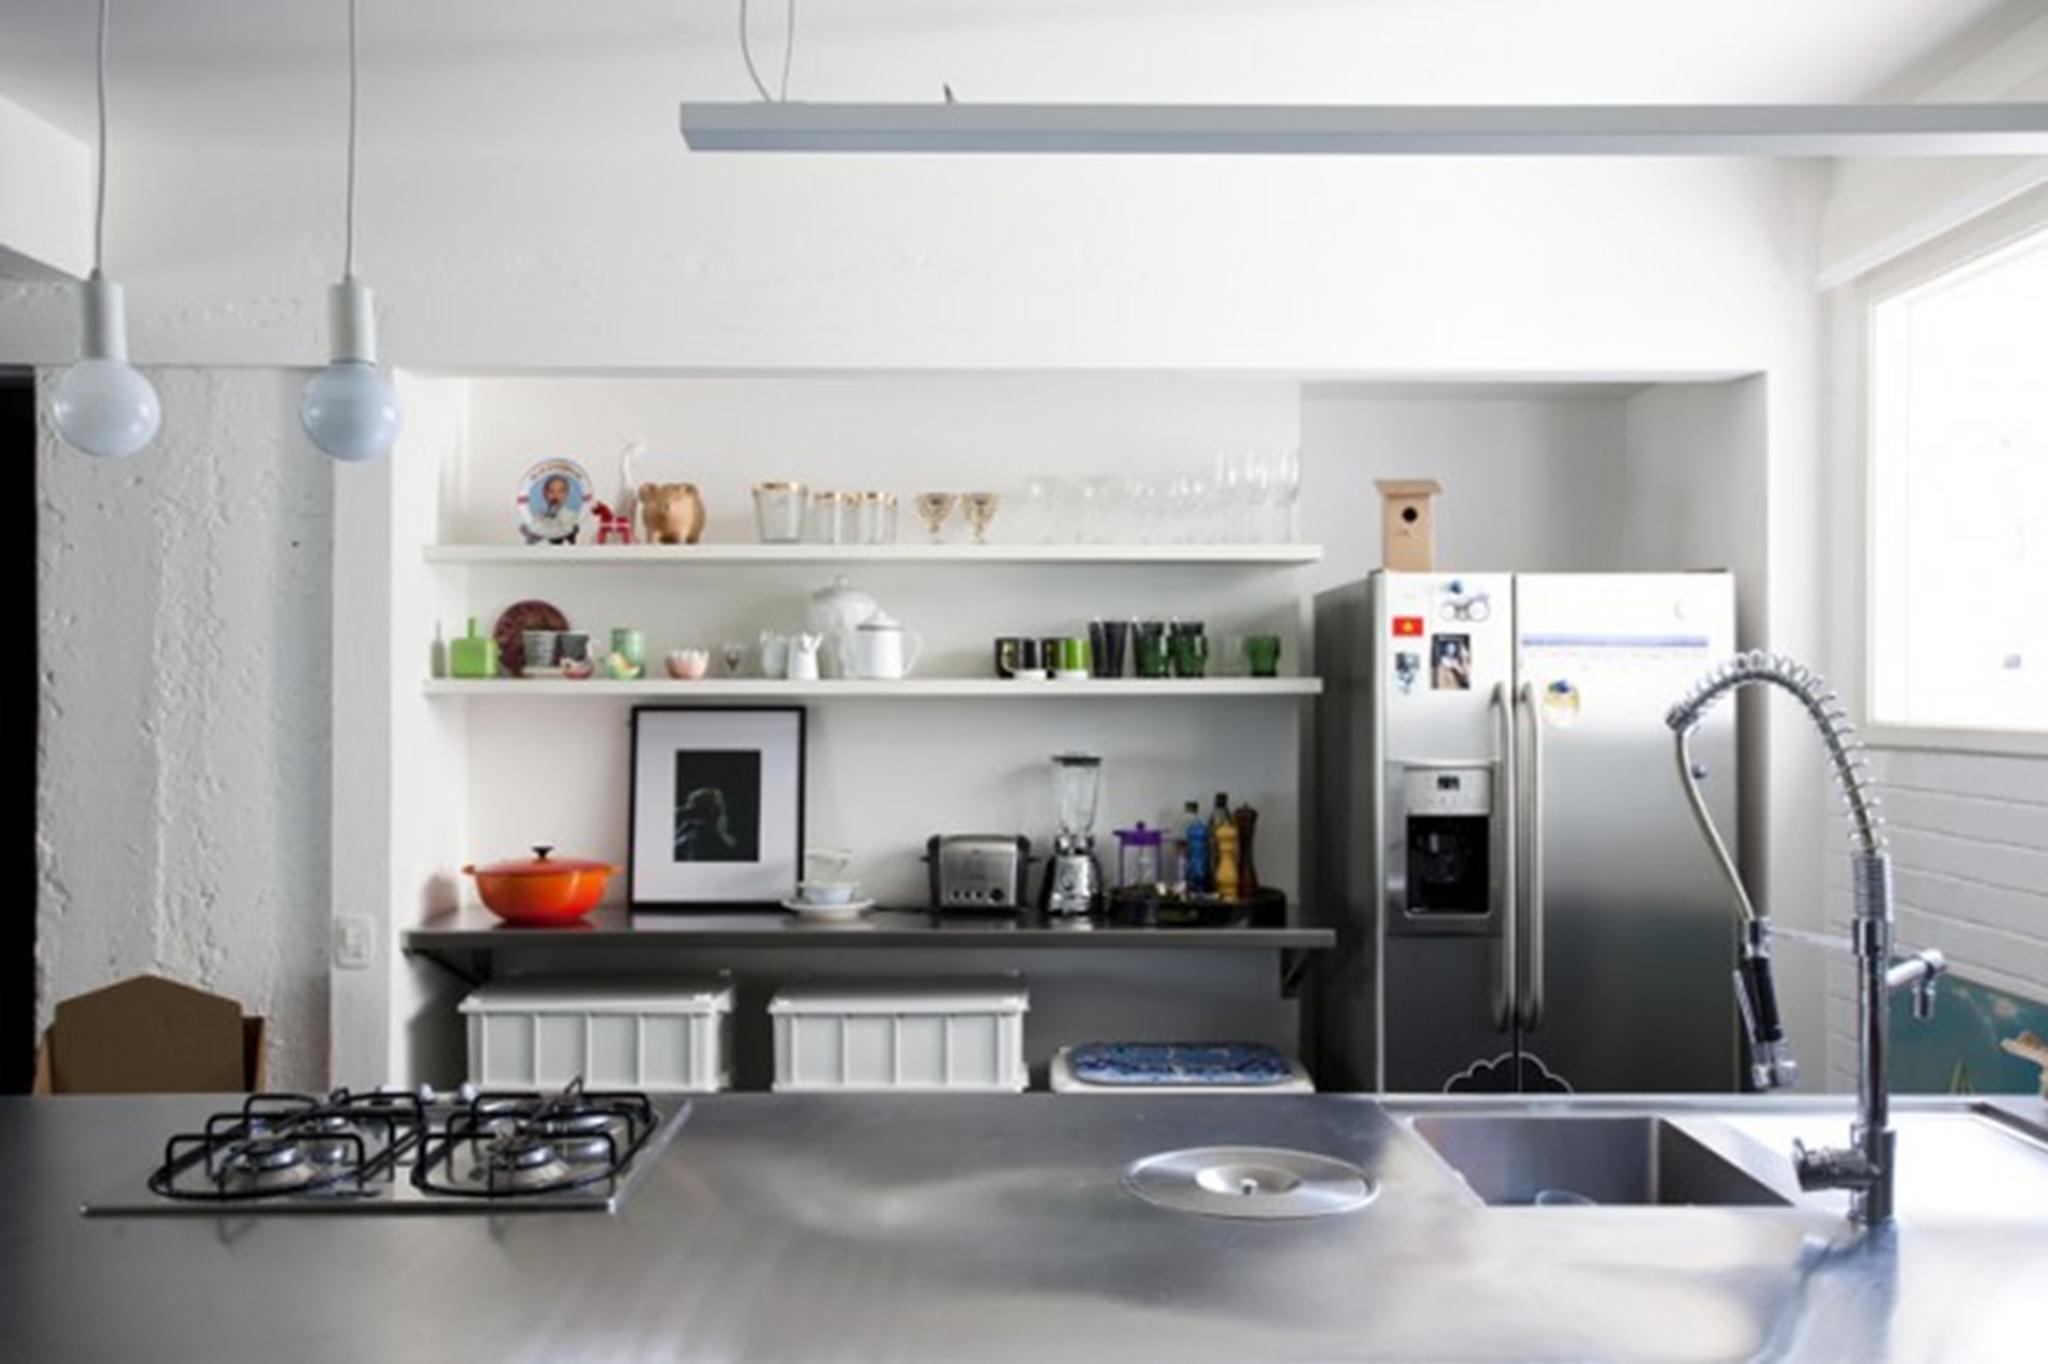 architects-apartment3 (Copy)